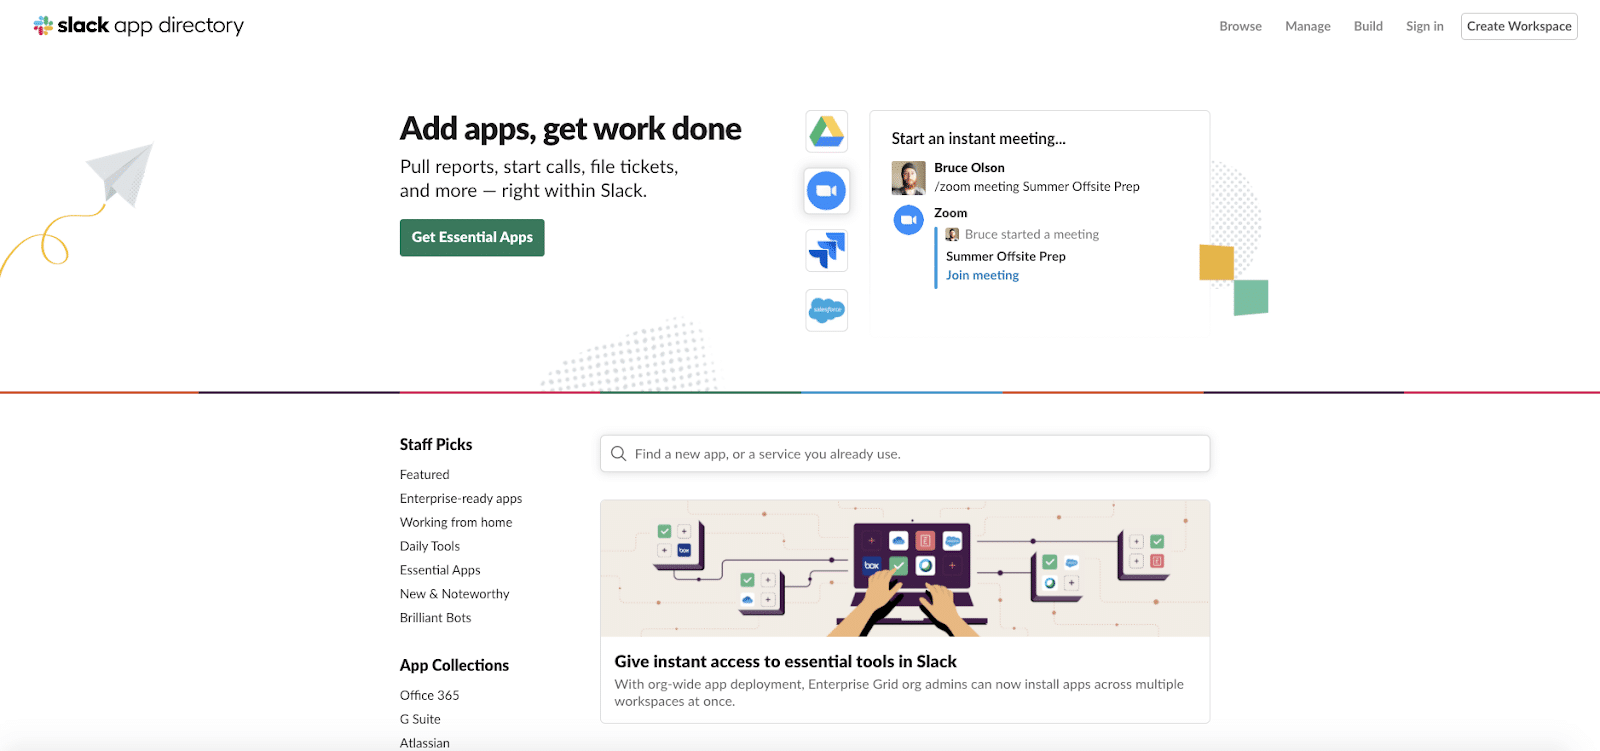 Slack's app directory